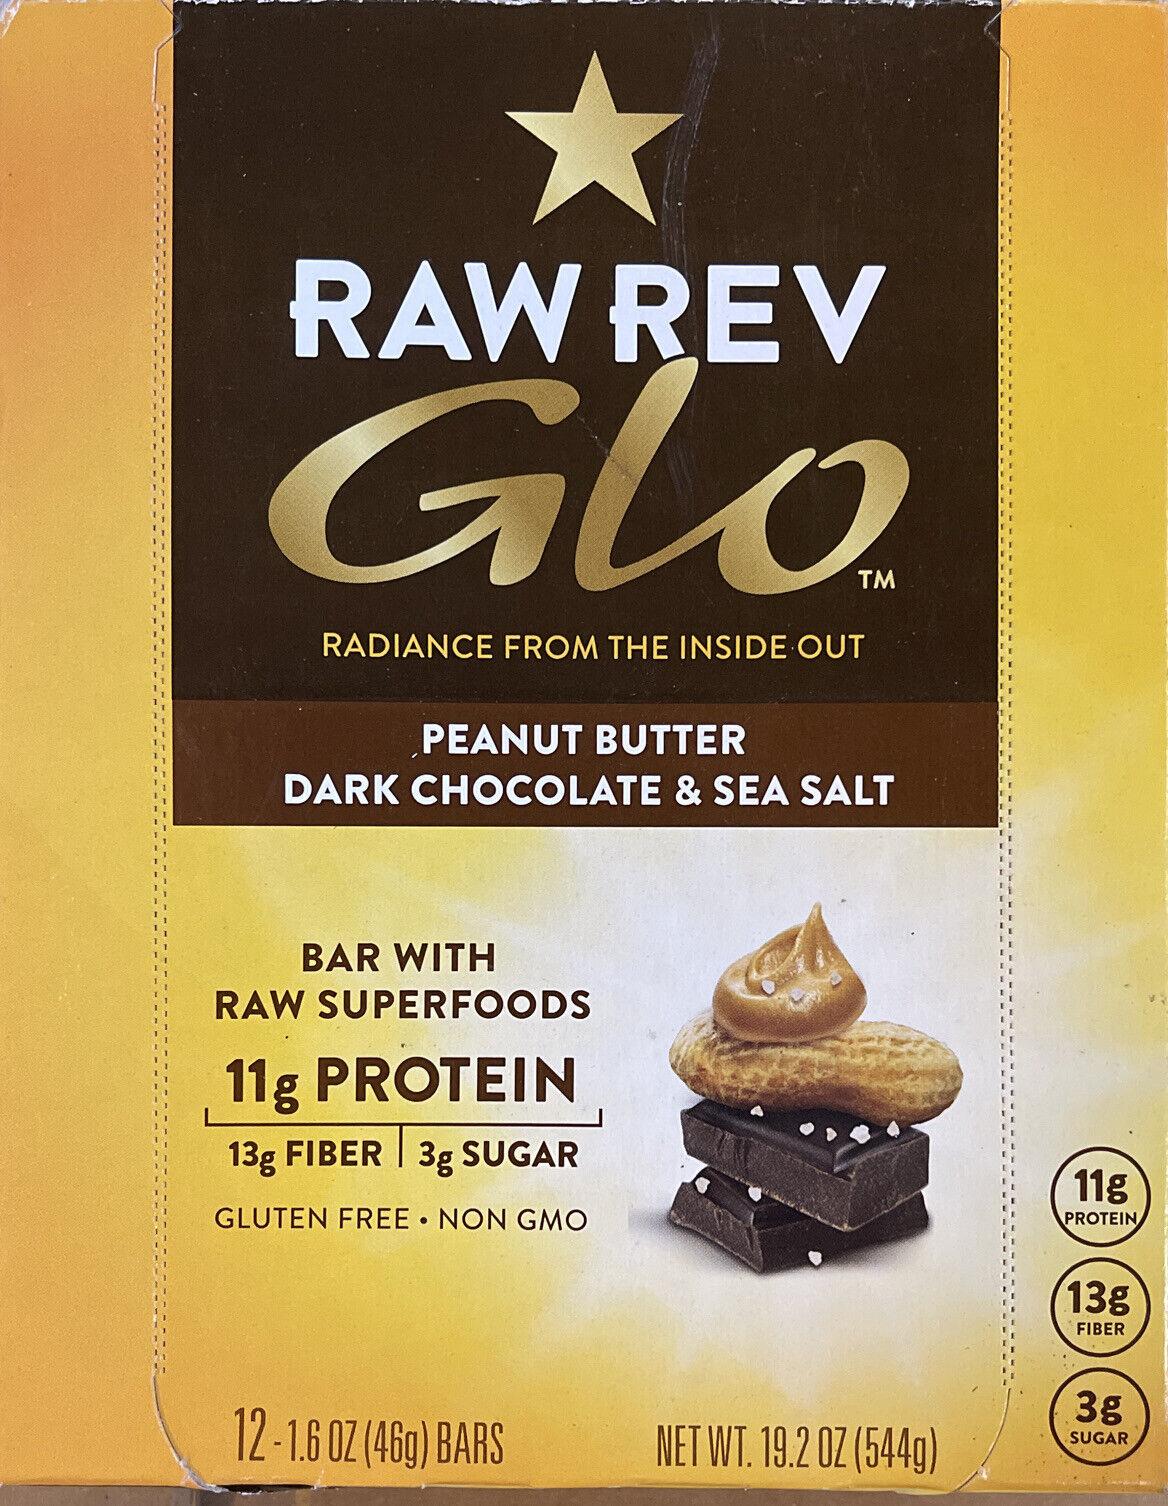 Raw Rev Glo Vegan Gluten-Free Protein Bars - Peanut 12 Count (Pack of 1) 1/26/21